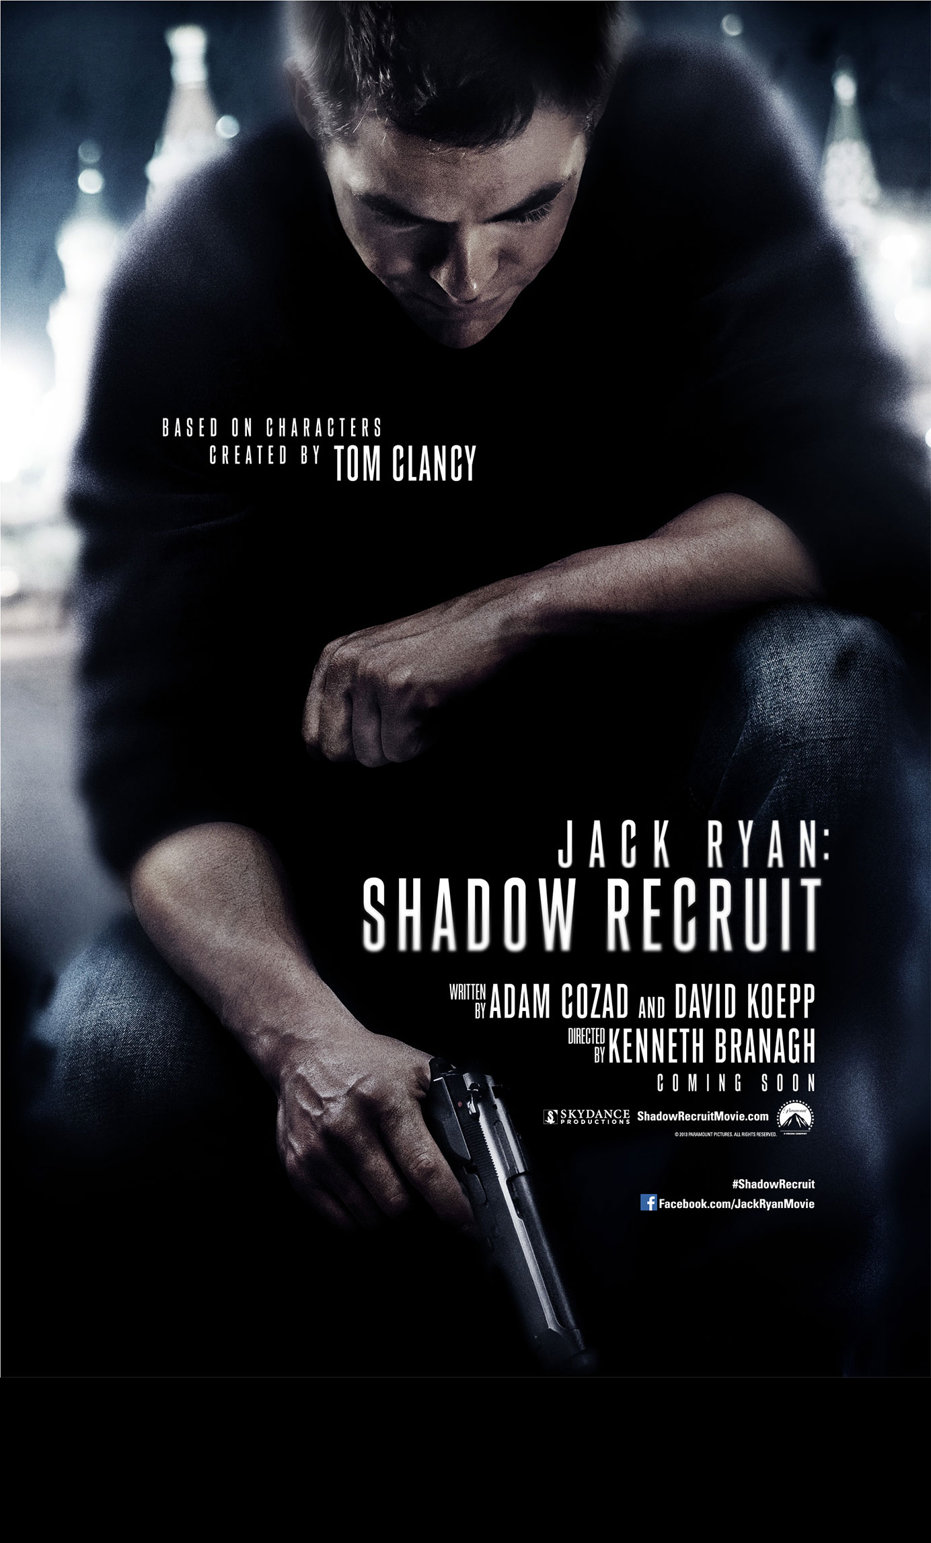 jack-ryan-shadow-recruit-poster.jpg